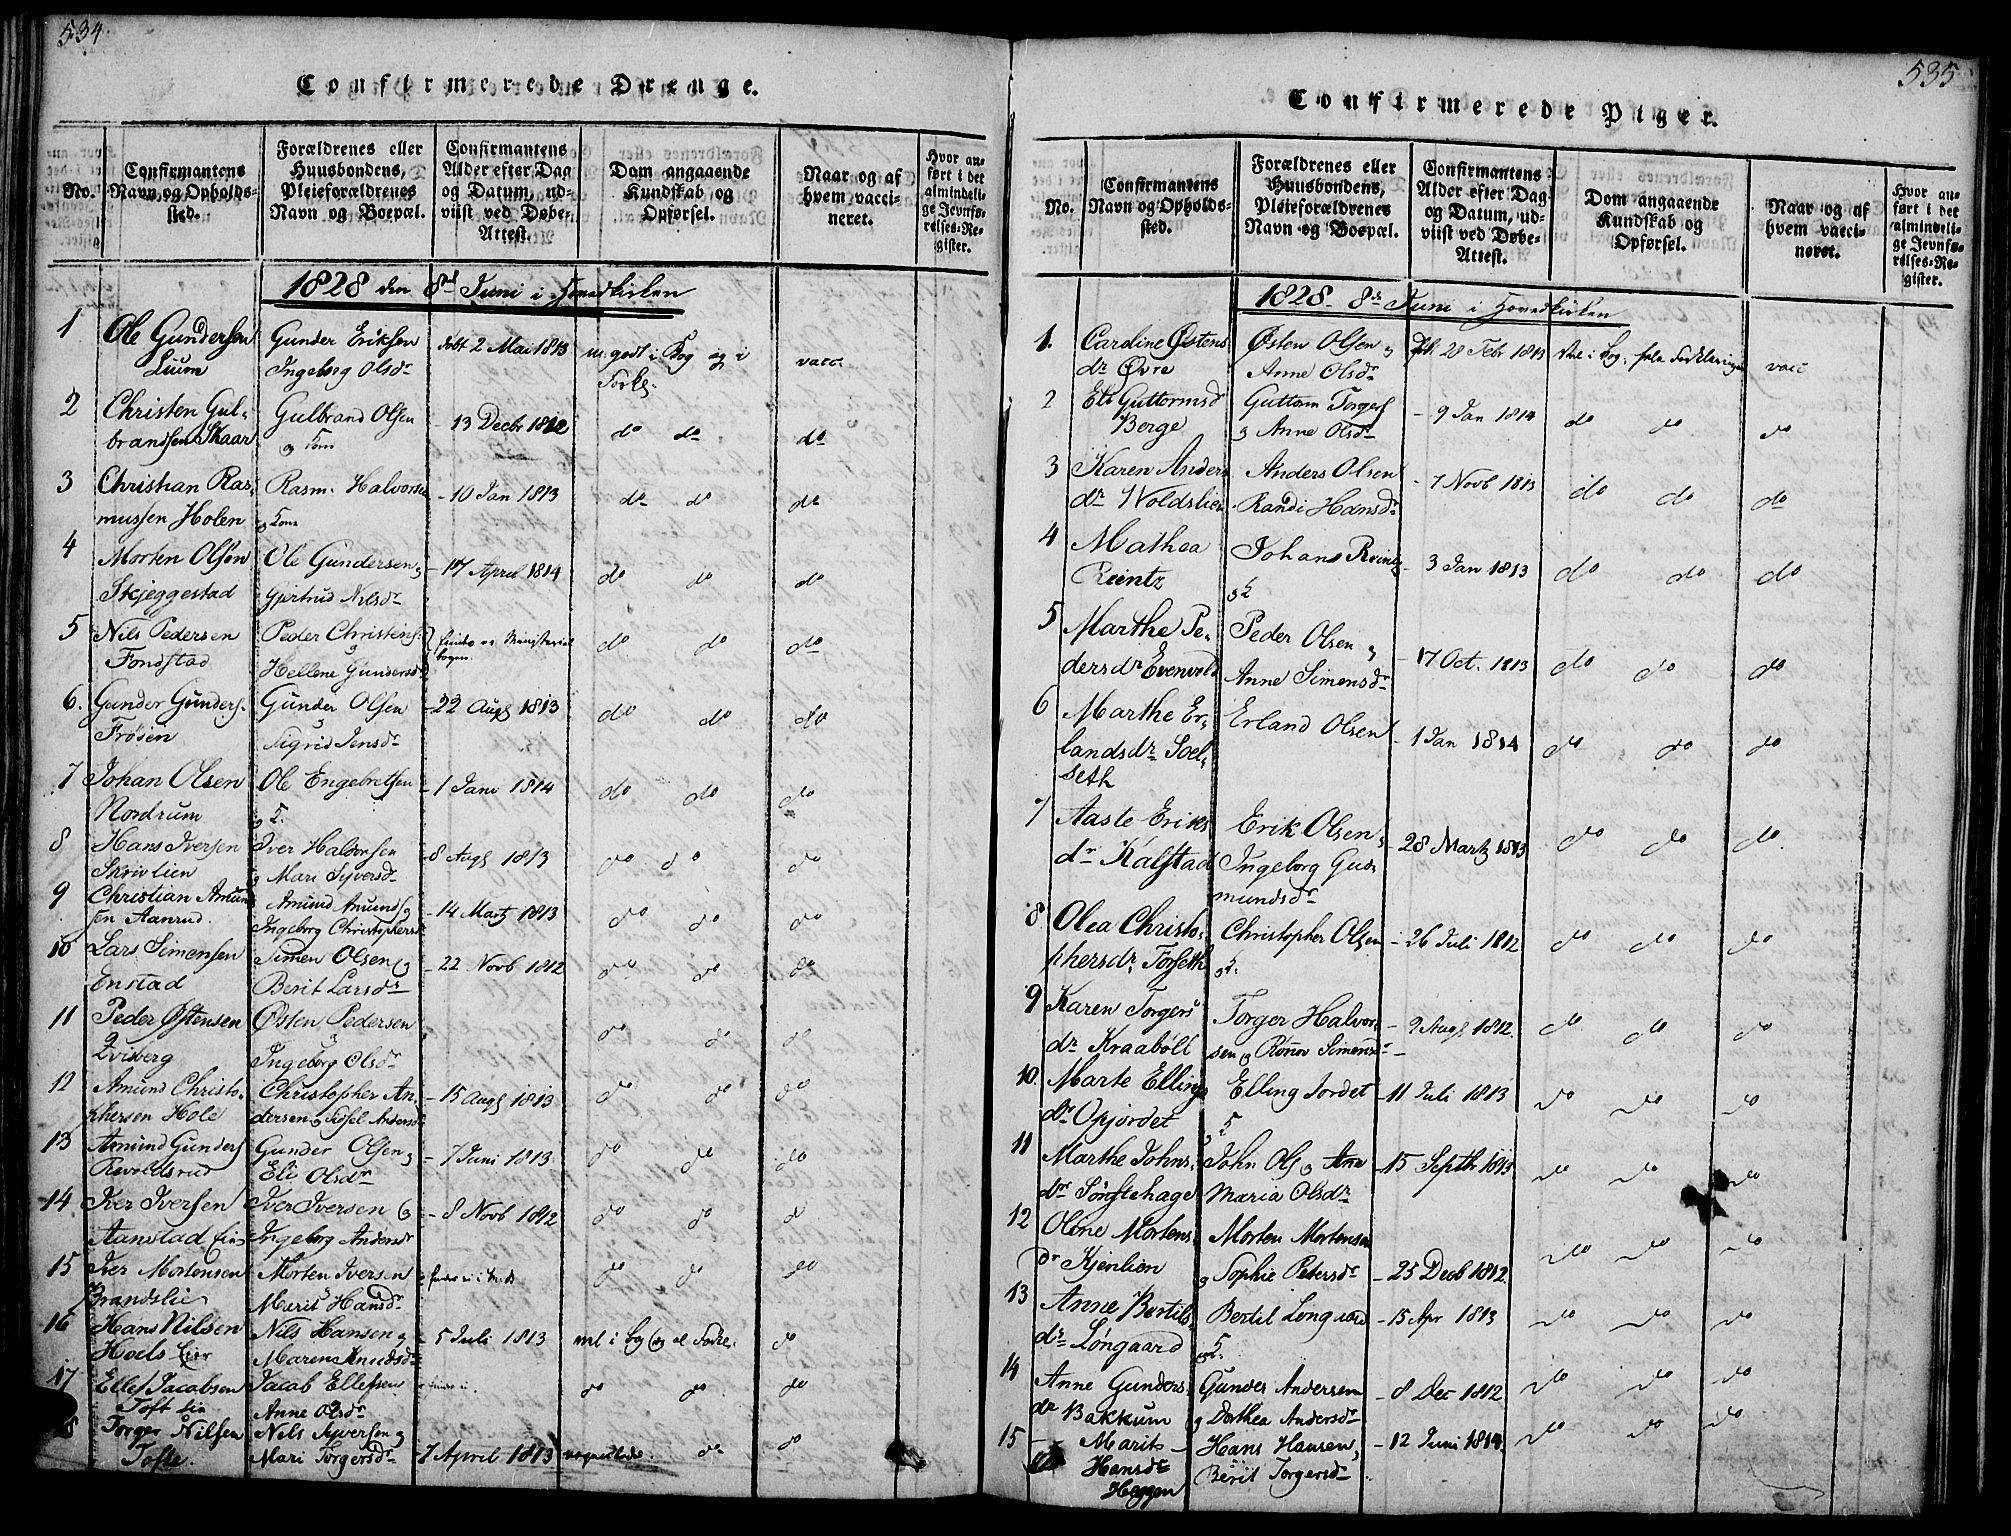 SAH, Gausdal prestekontor, Ministerialbok nr. 5, 1817-1829, s. 534-535